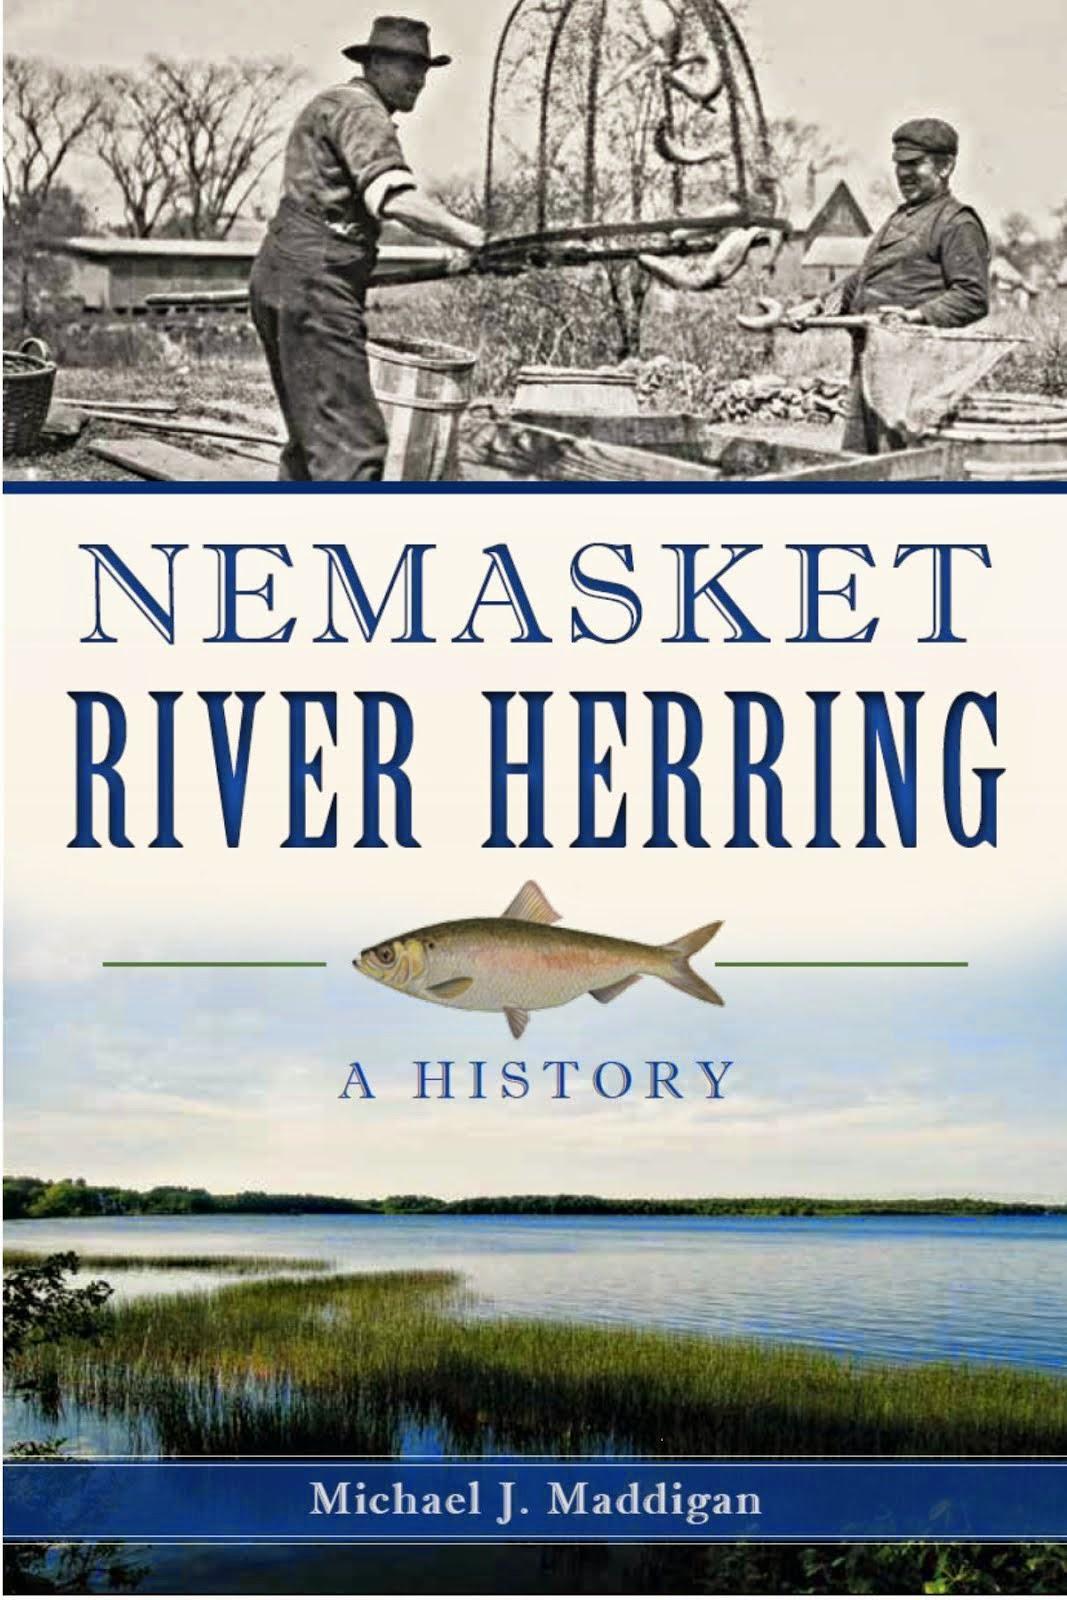 Nemasket River Herring: A History